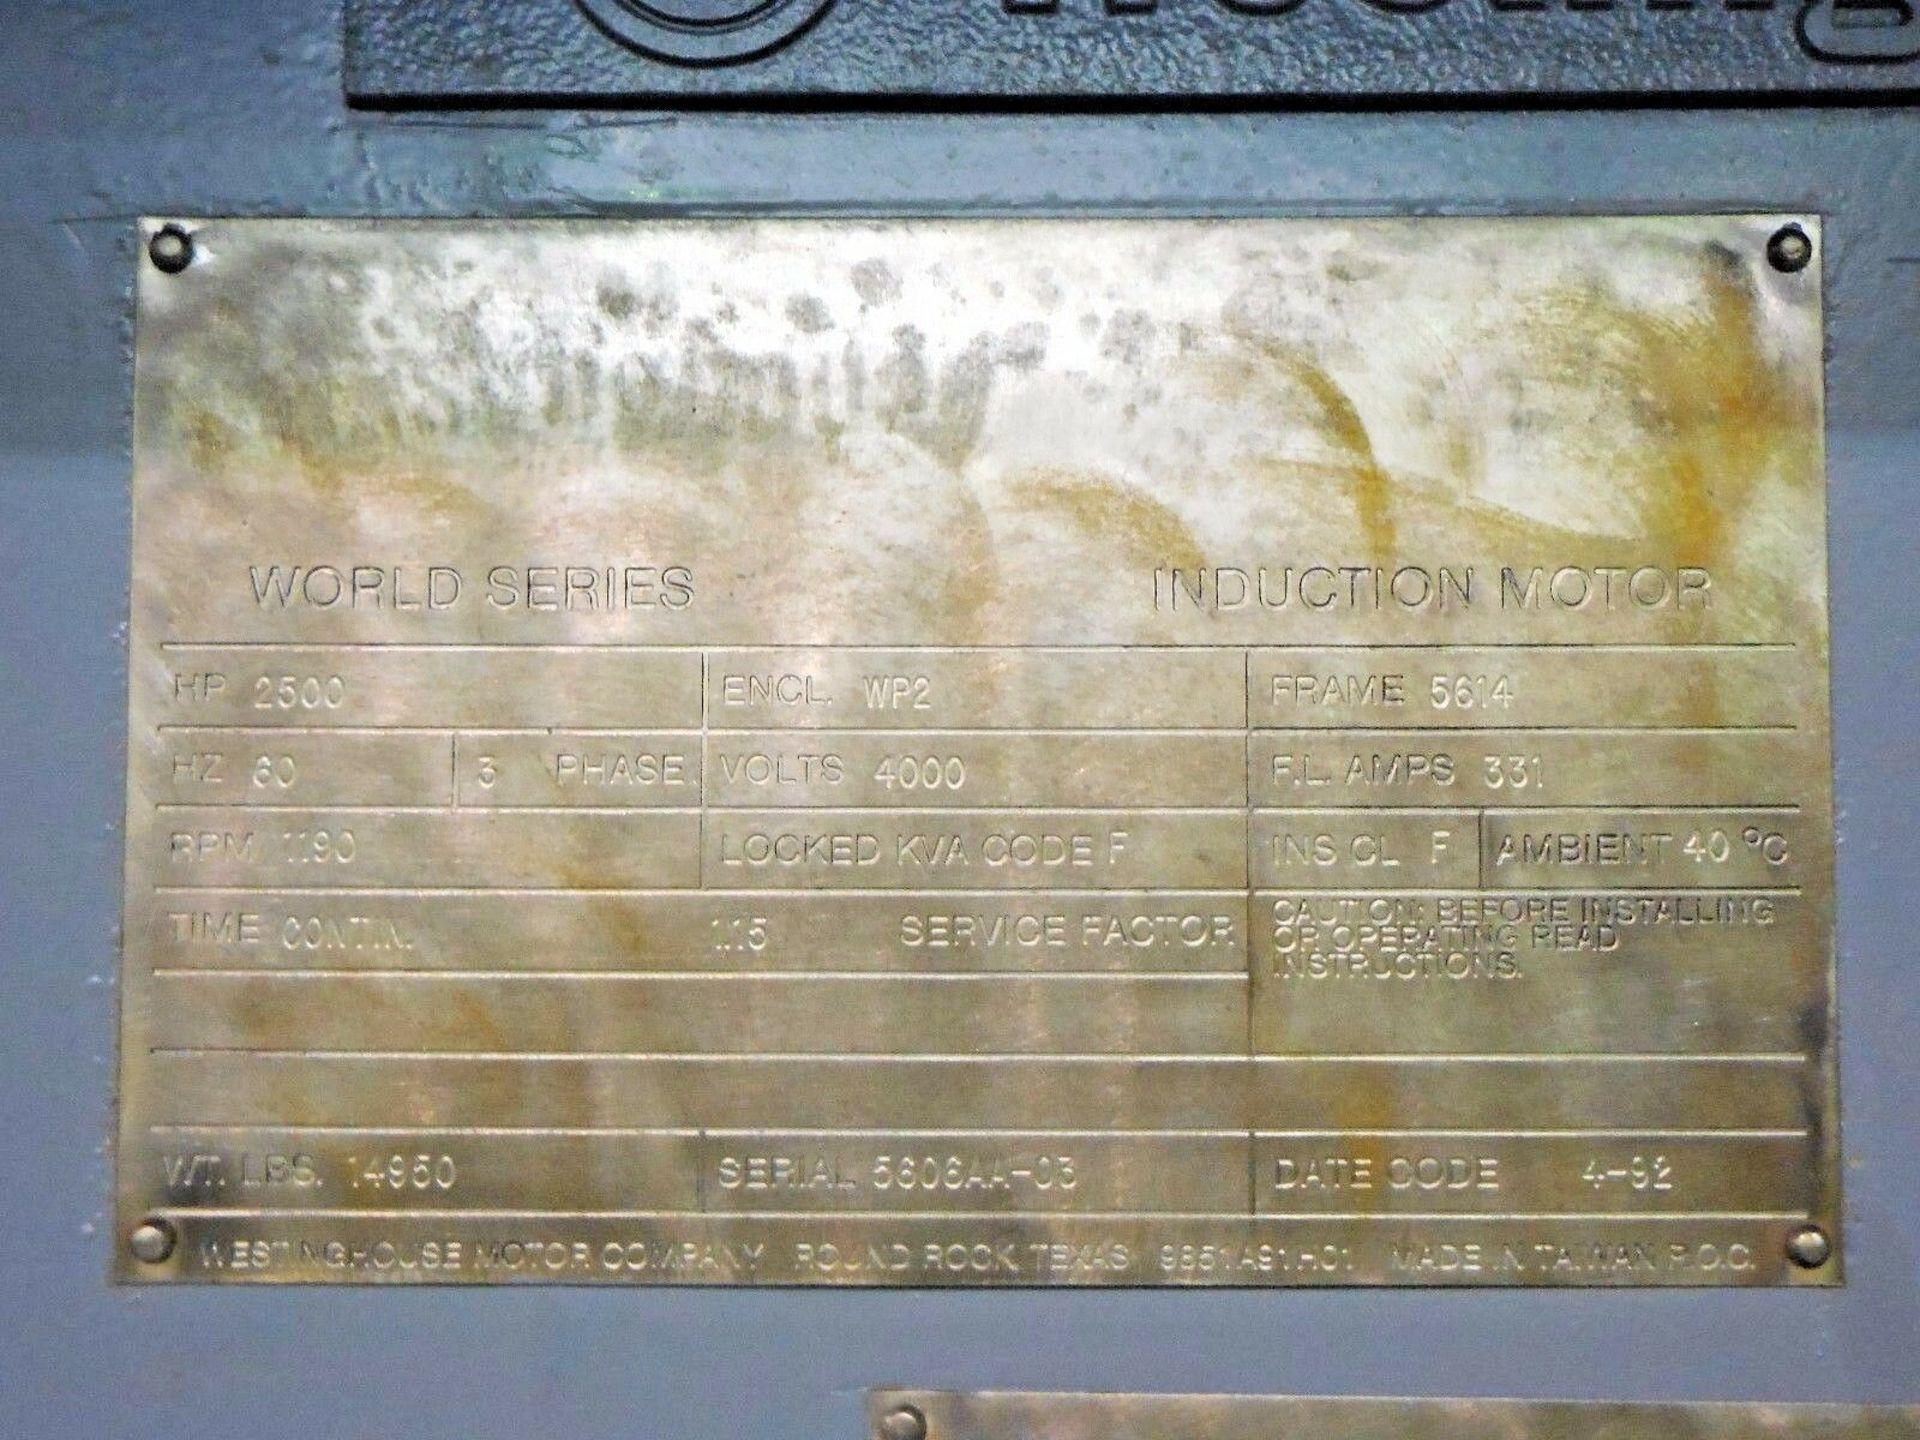 Westinghouse 2500 HP Induction Motor. 1190 RPM. 5614. 4000 V. 3 Ph. 60 Hz. - Image 4 of 4